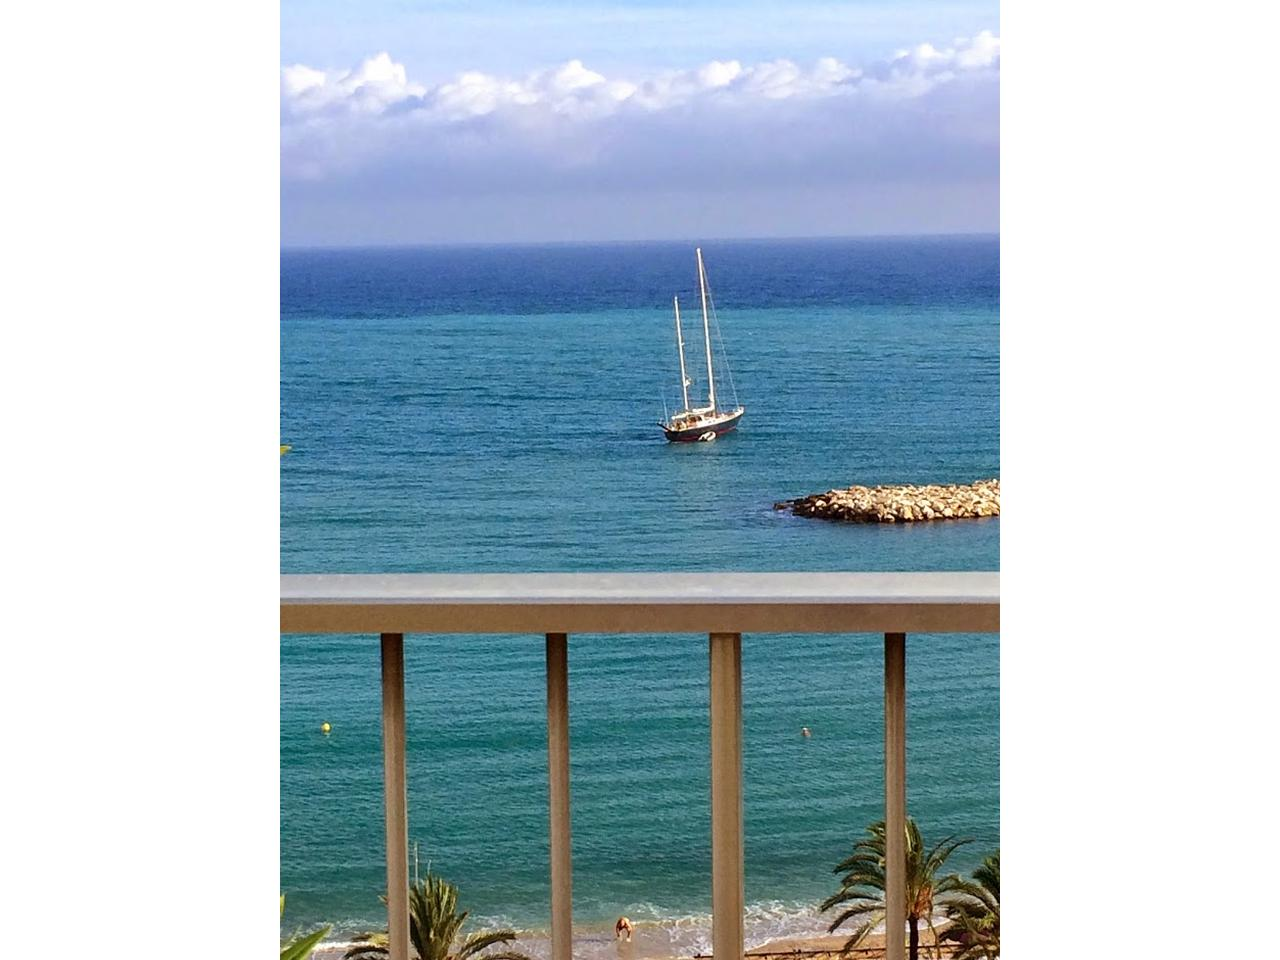 immobilier nice vue mer appartement menton villa sur toit menton bord de mer a vendre neuf. Black Bedroom Furniture Sets. Home Design Ideas